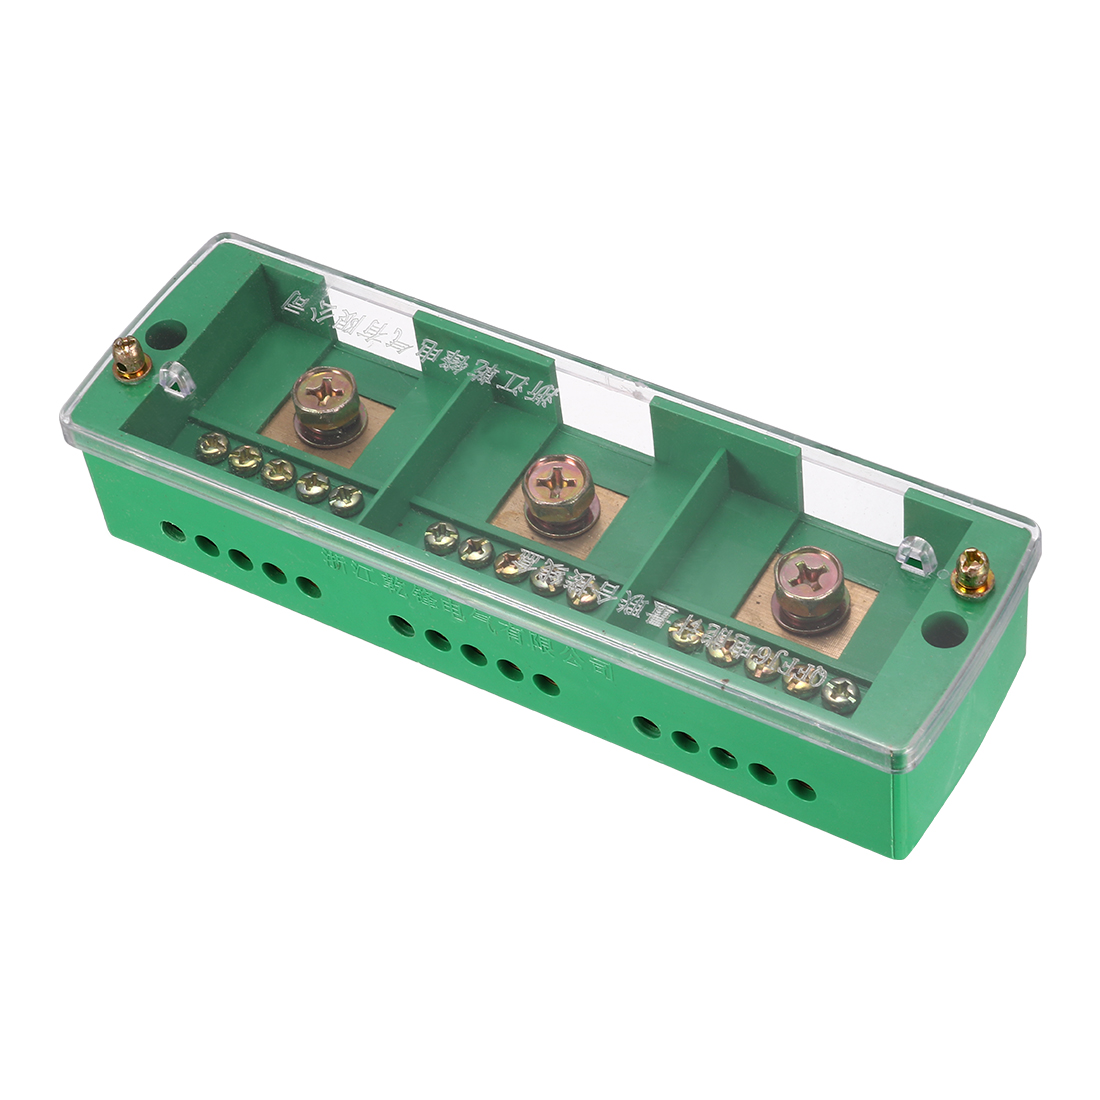 3 Inlet 15 Outlet Terminal Strip Blocks Single Phase Distribution Block